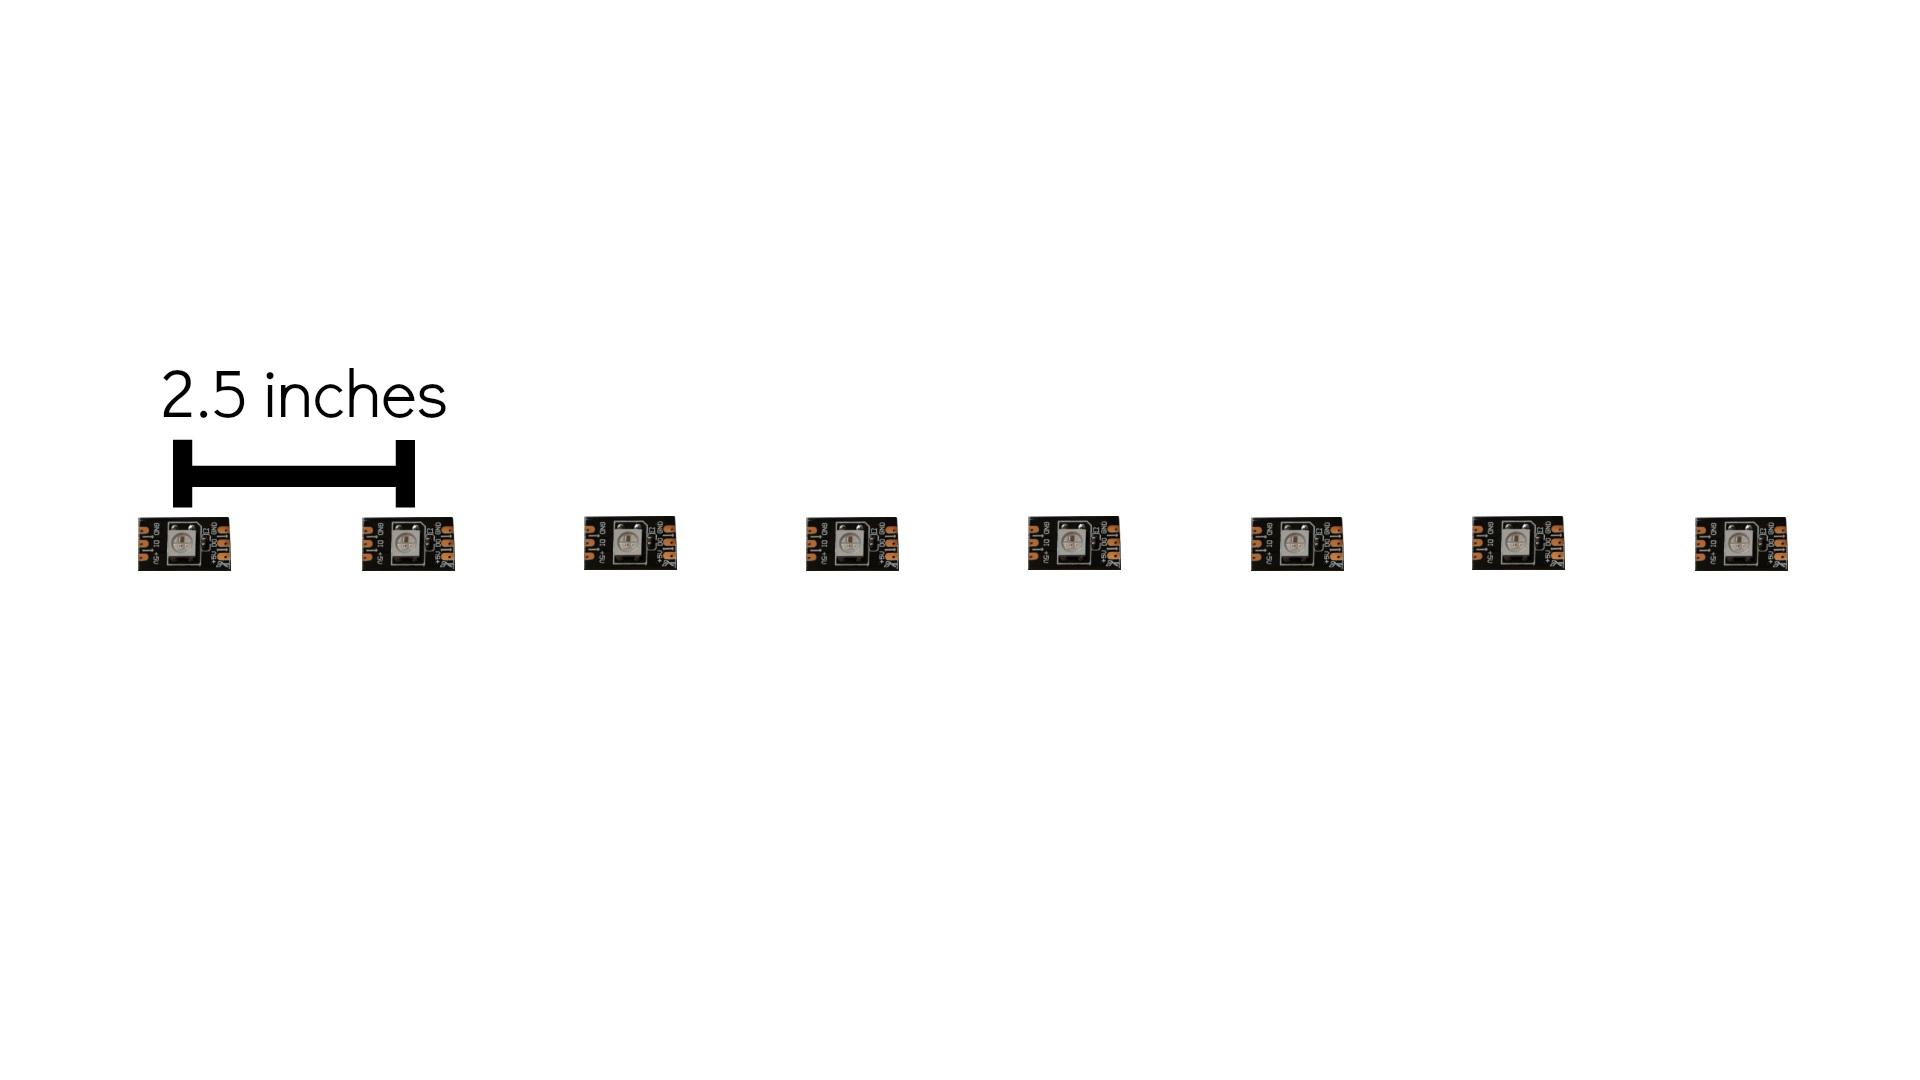 Picture of Neopixels